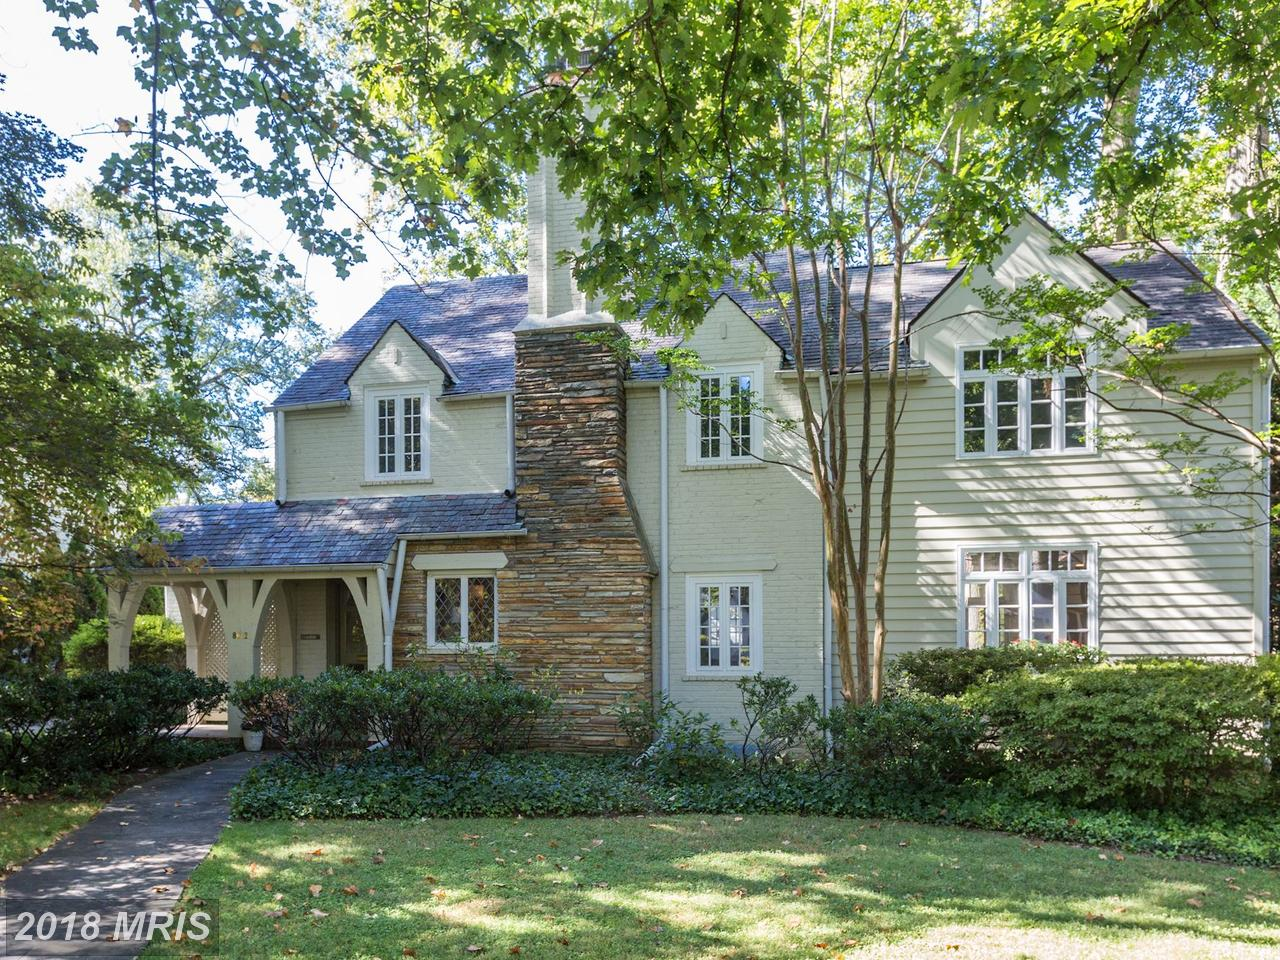 Single Family Home for Sale at Tudor, Detached - BETHESDA, MD 8012 HAMPDEN LN Bethesda, Maryland,20814 United States